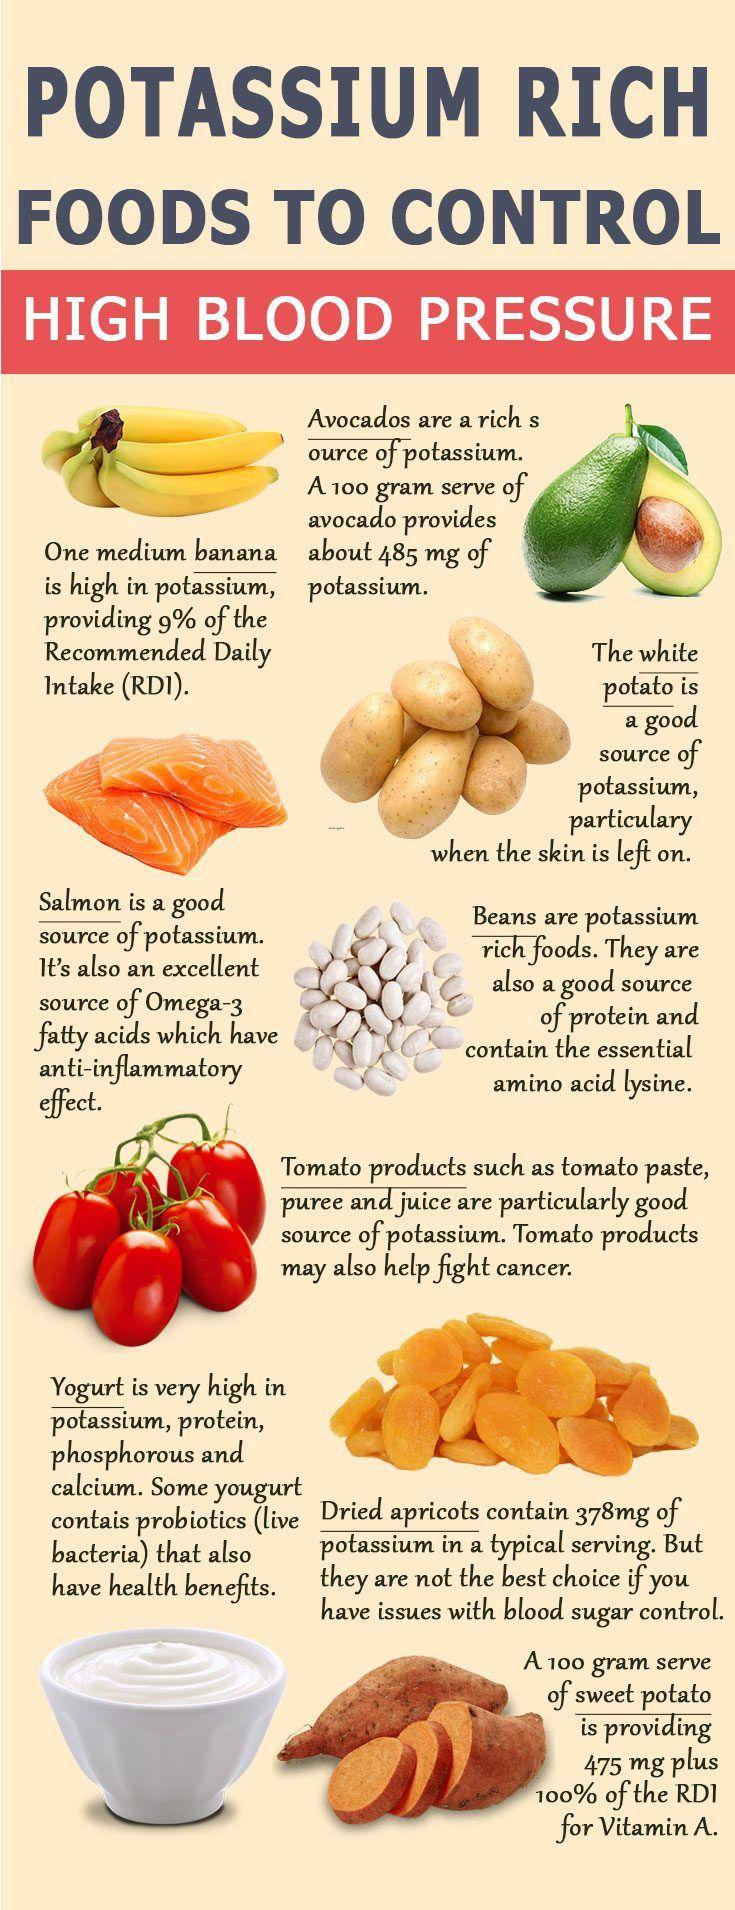 High Potassium Foods for the Keto Diet